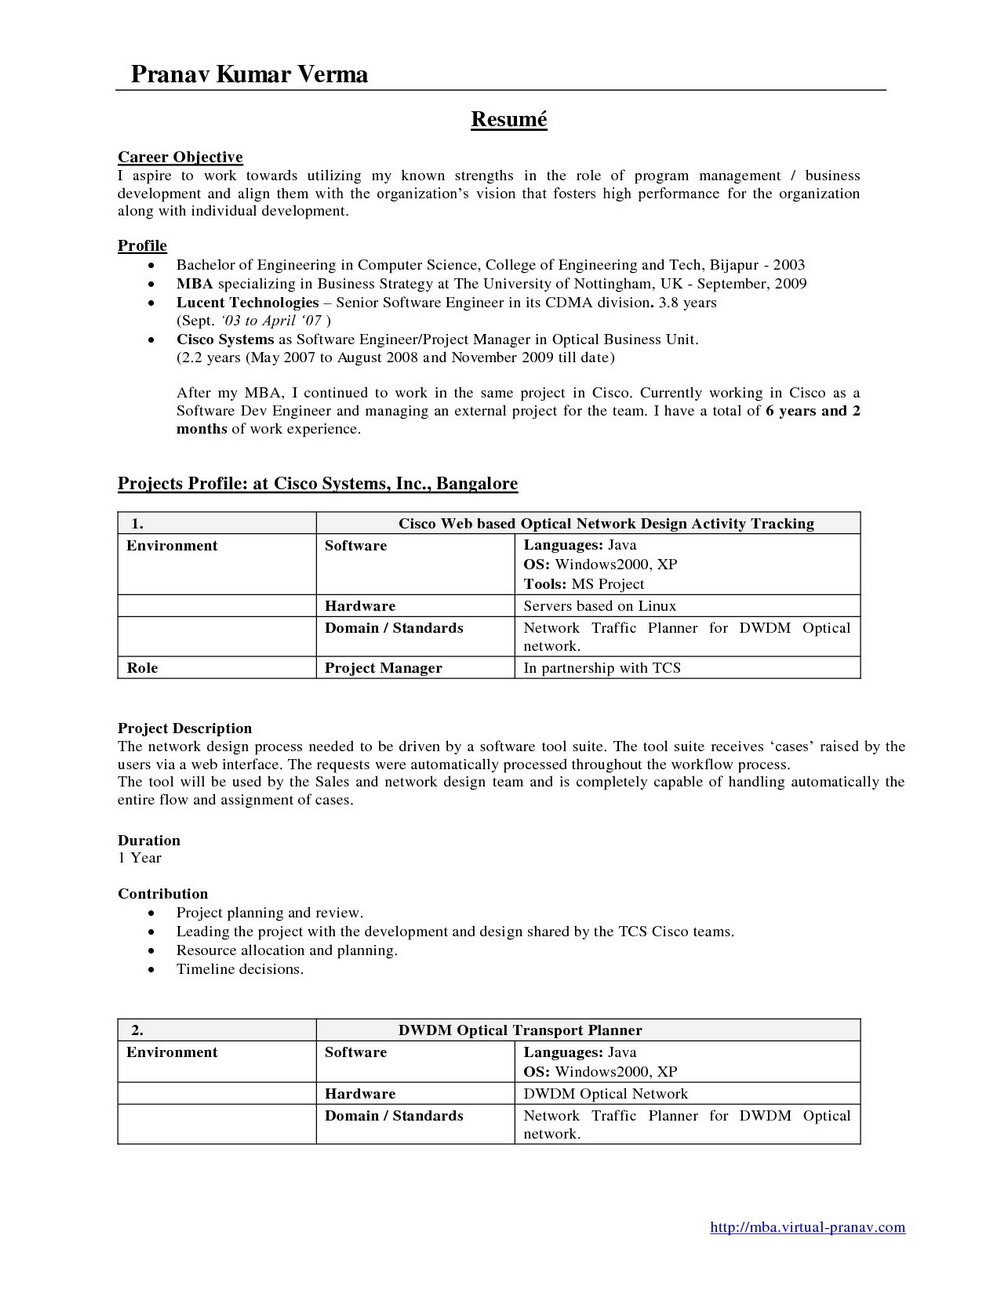 Tcs Website To Upload Resume